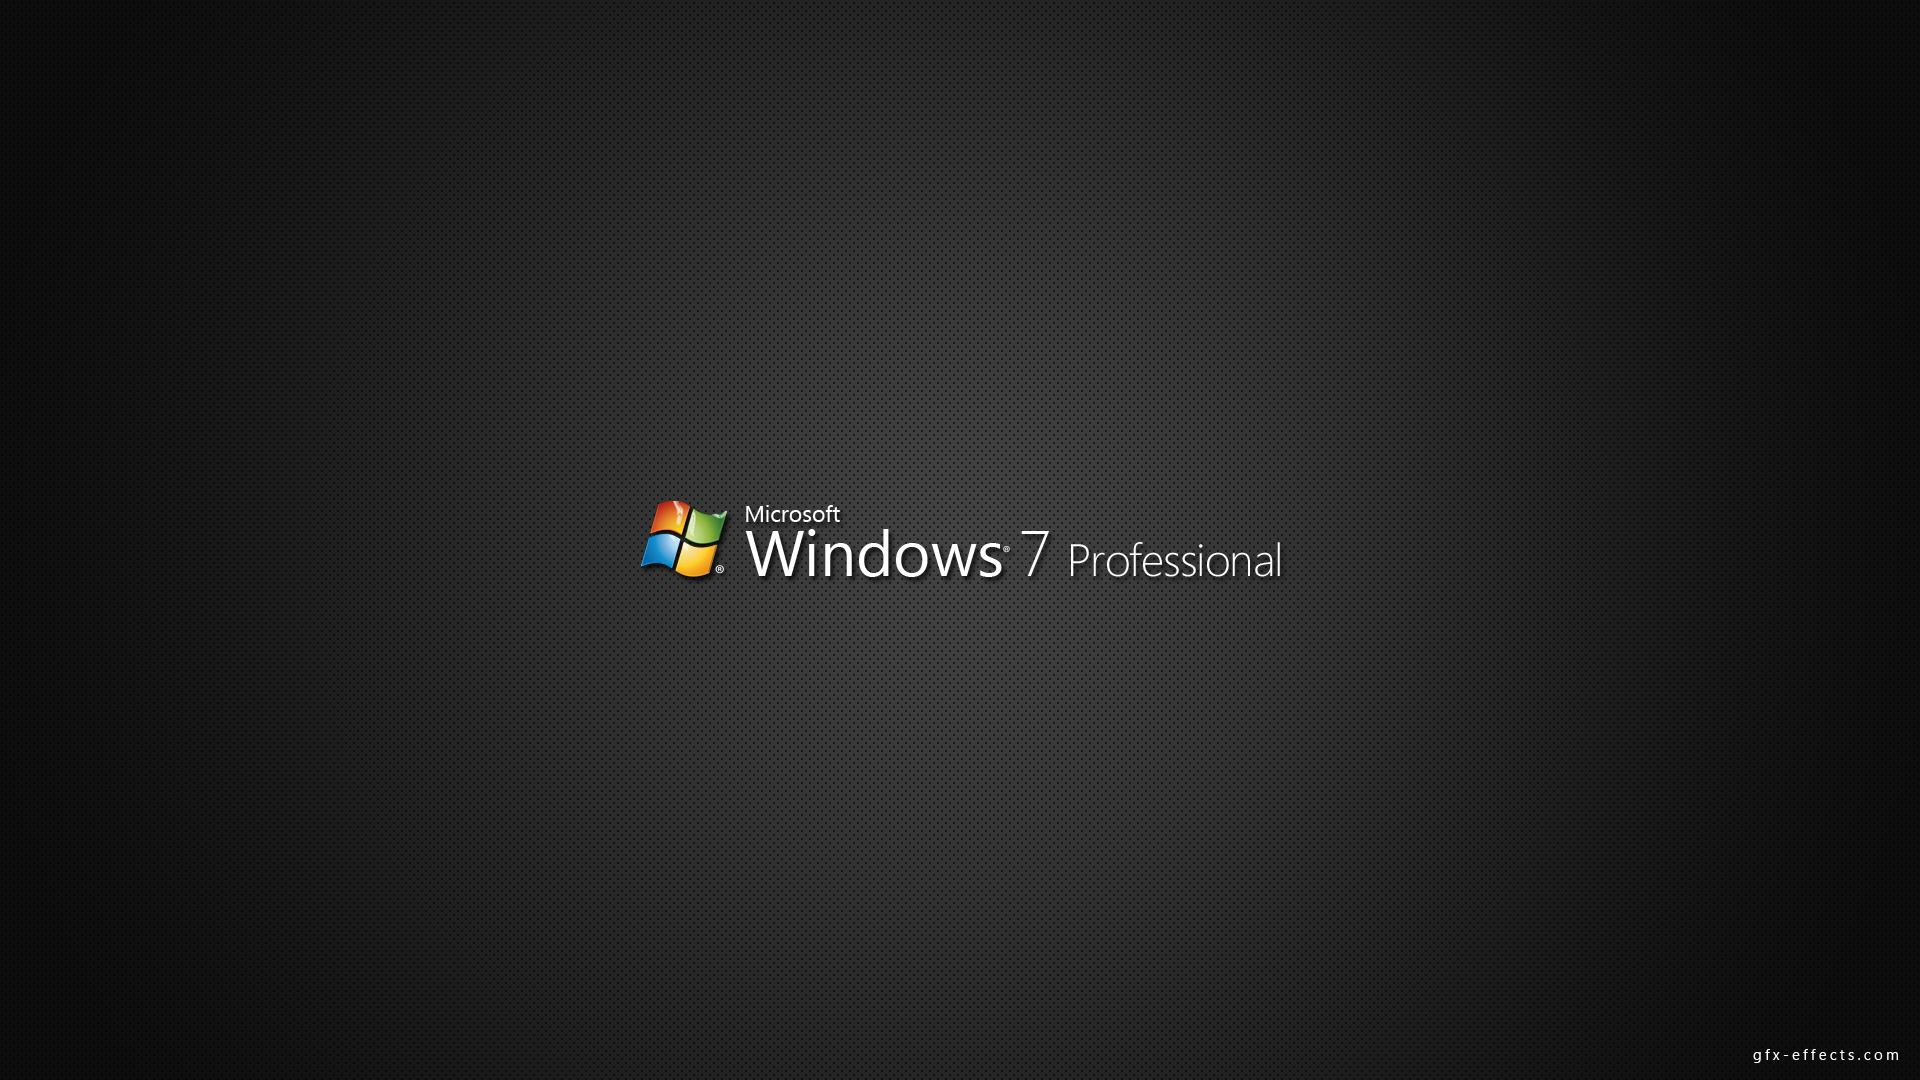 tags windows windows 7 date 10 10 11 resolution 1920x1080 avg dl time 1920x1080